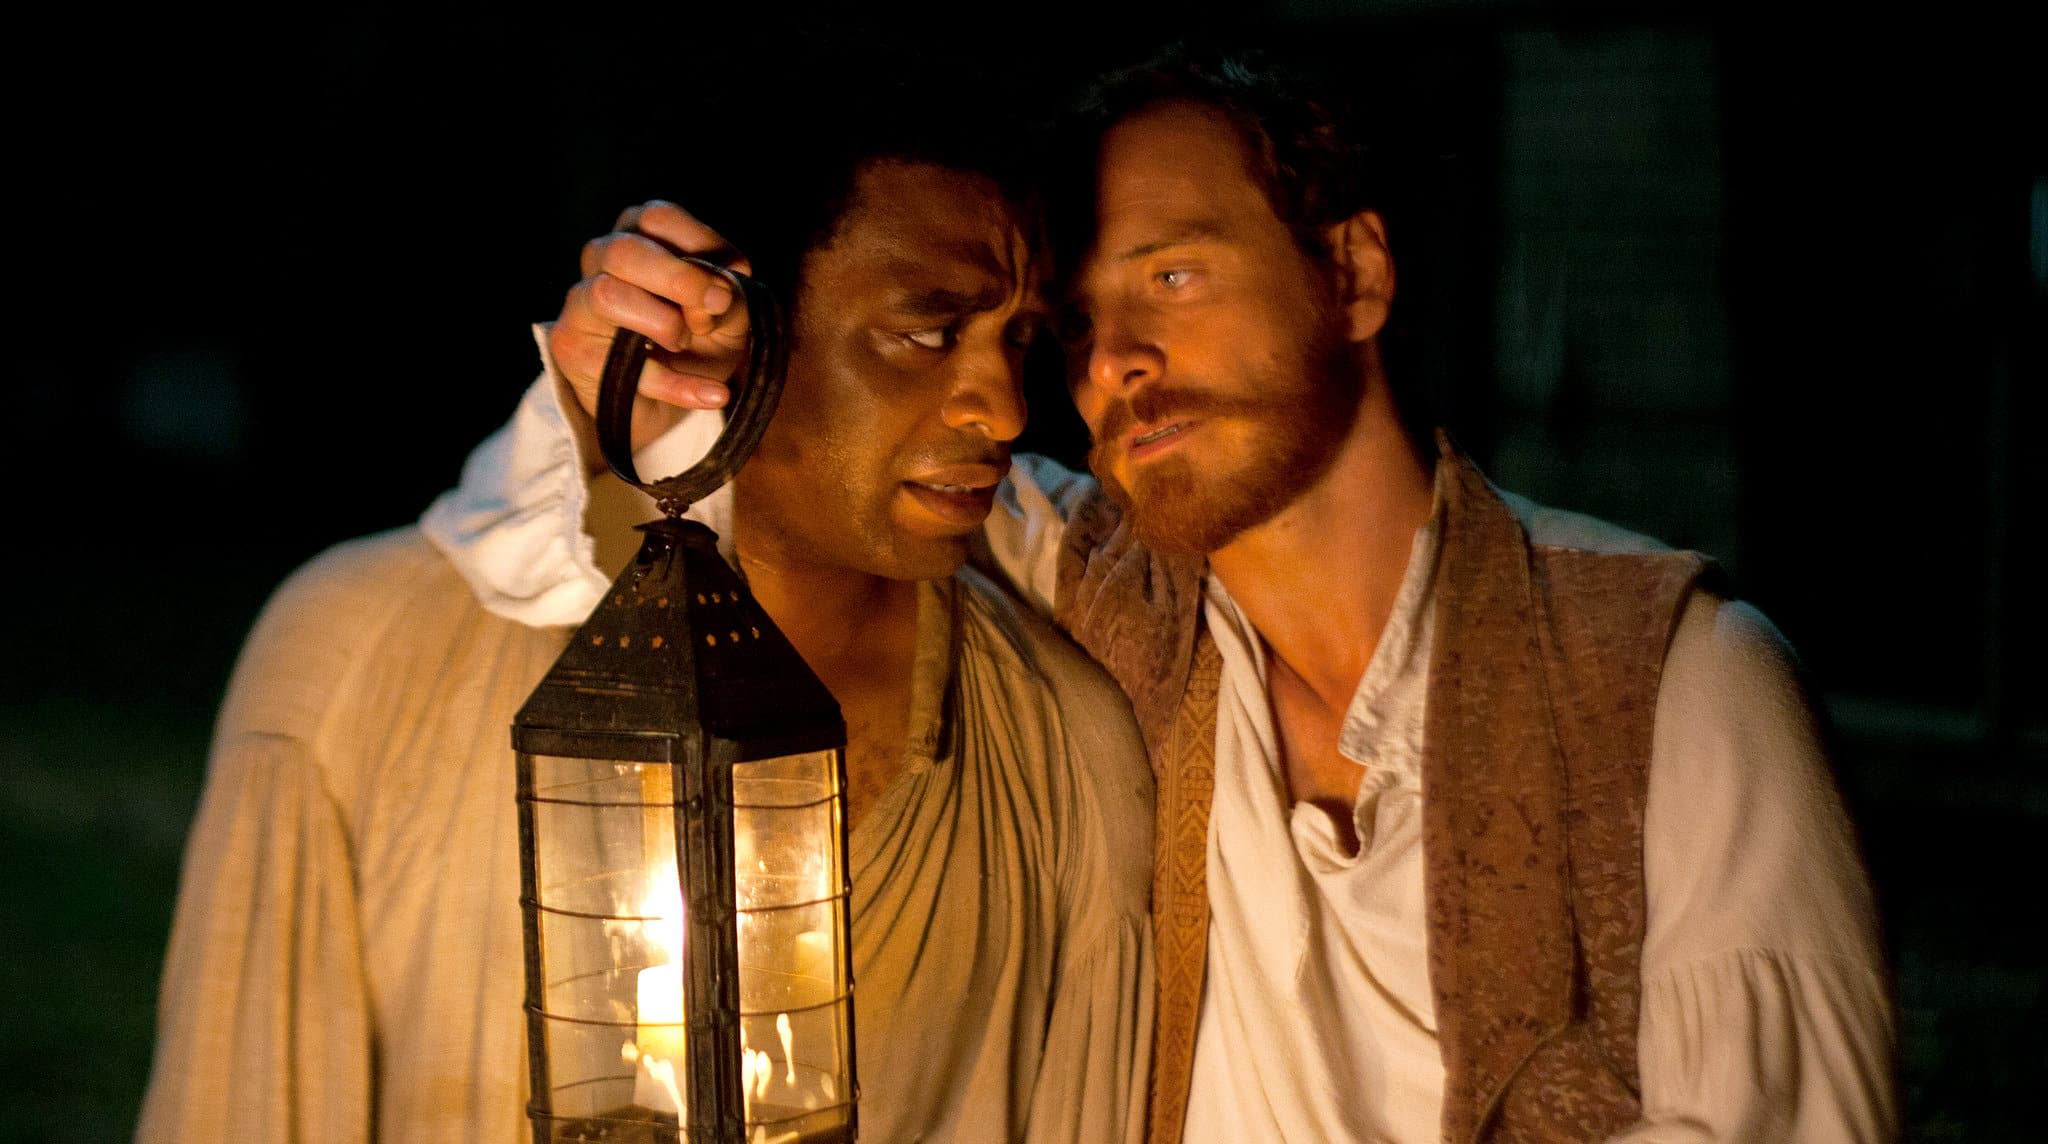 12 rokov otrokom filmy o rasizme